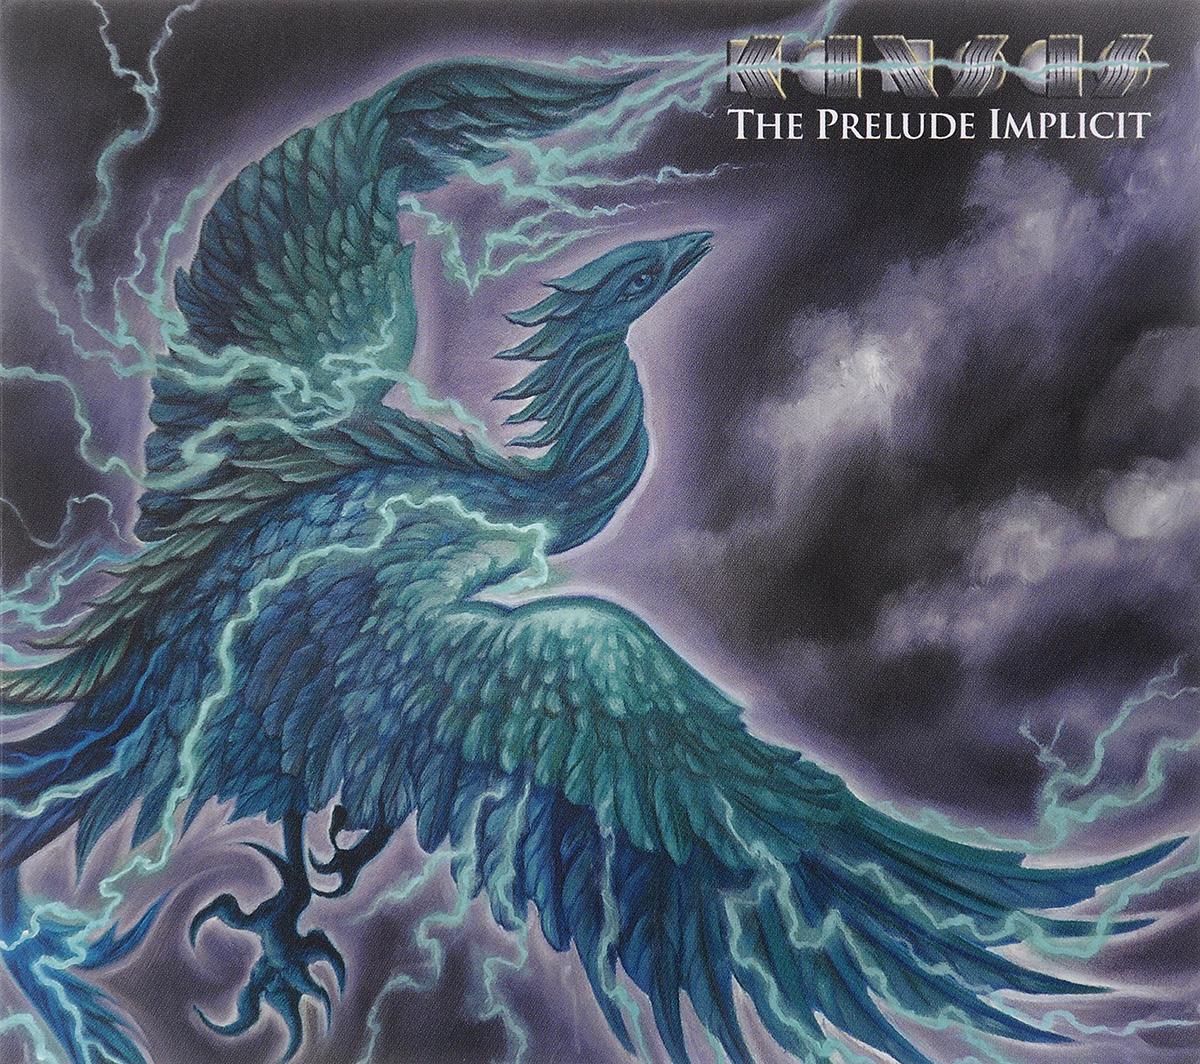 Kansas Kansas. The Prelude Implicit. Special Edition the prelude implicit lp cd